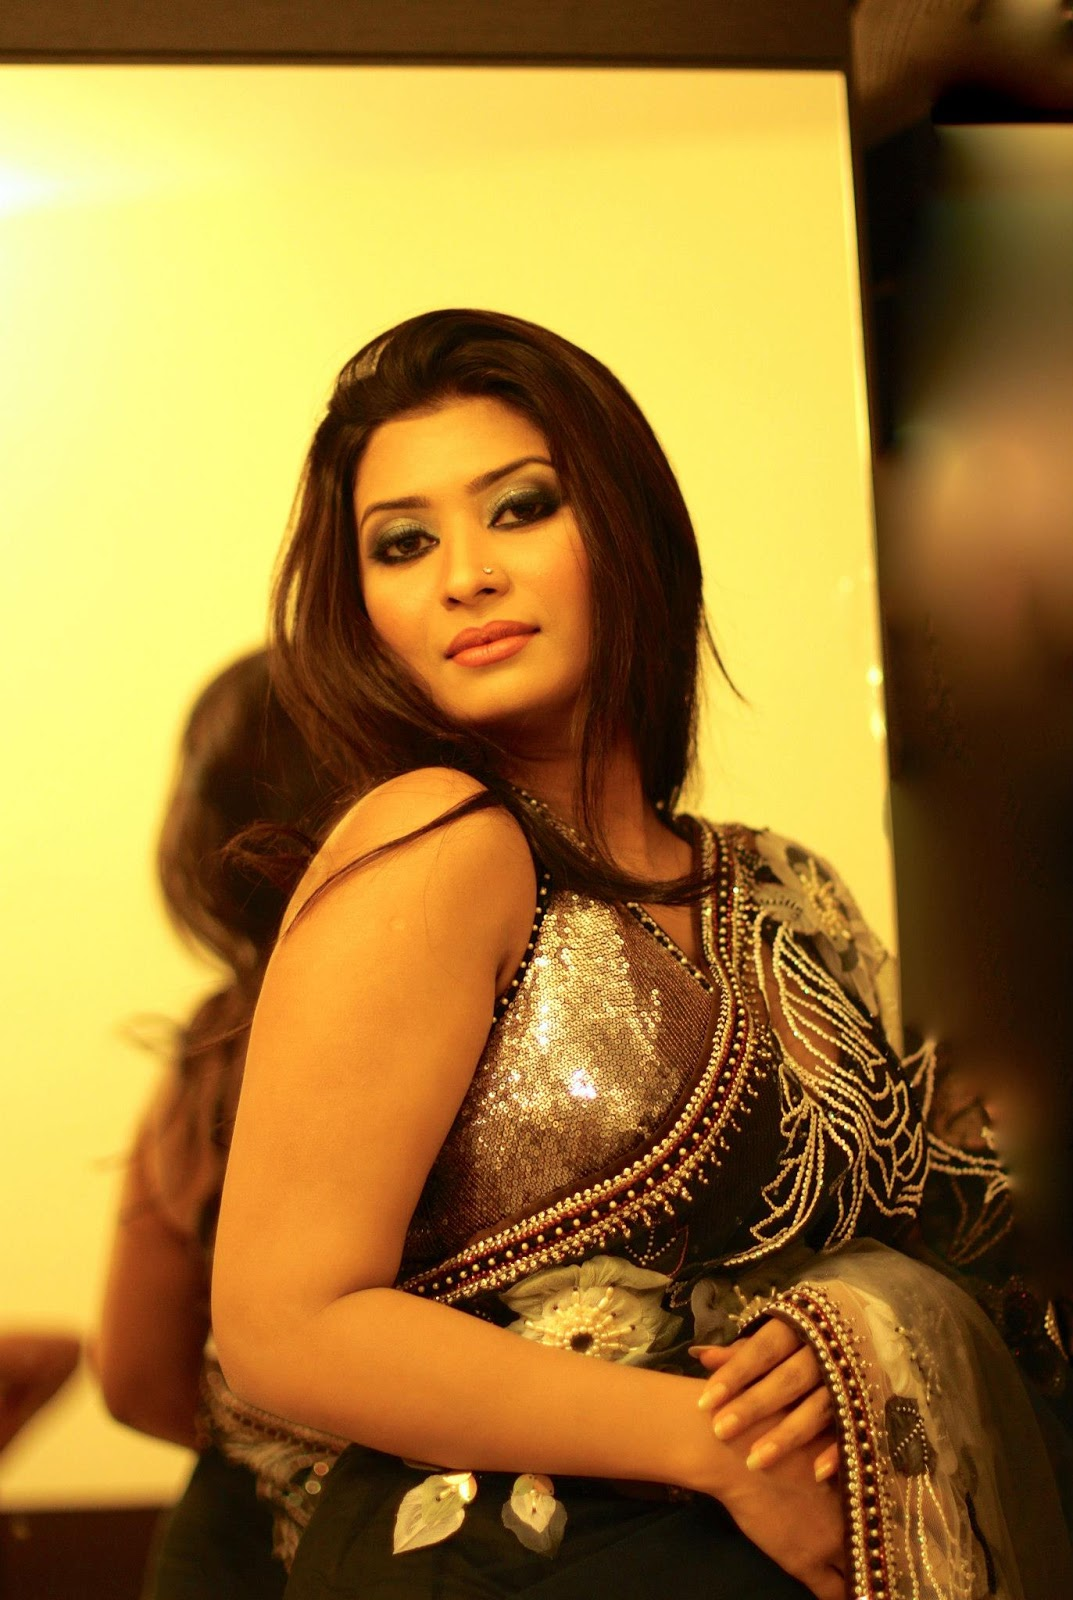 Sexi Girl In Delhi